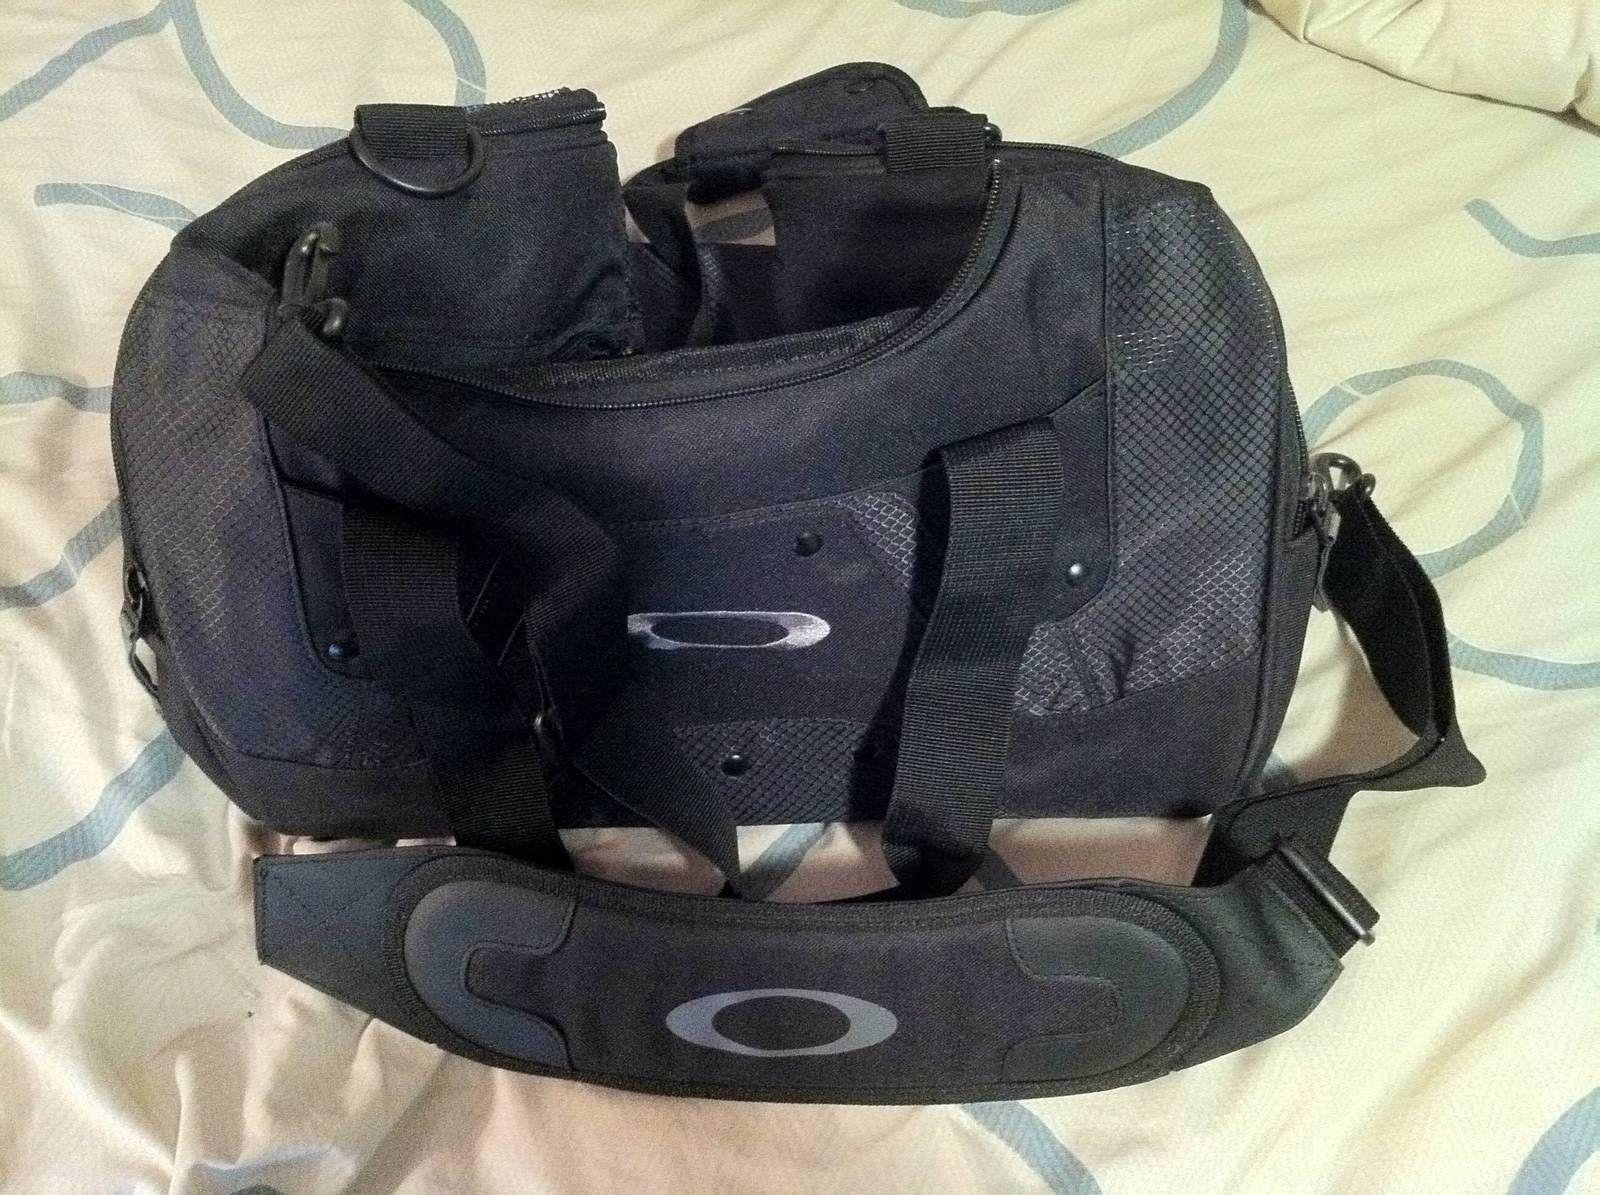 Duffle Bag! - iDMgm.jpg